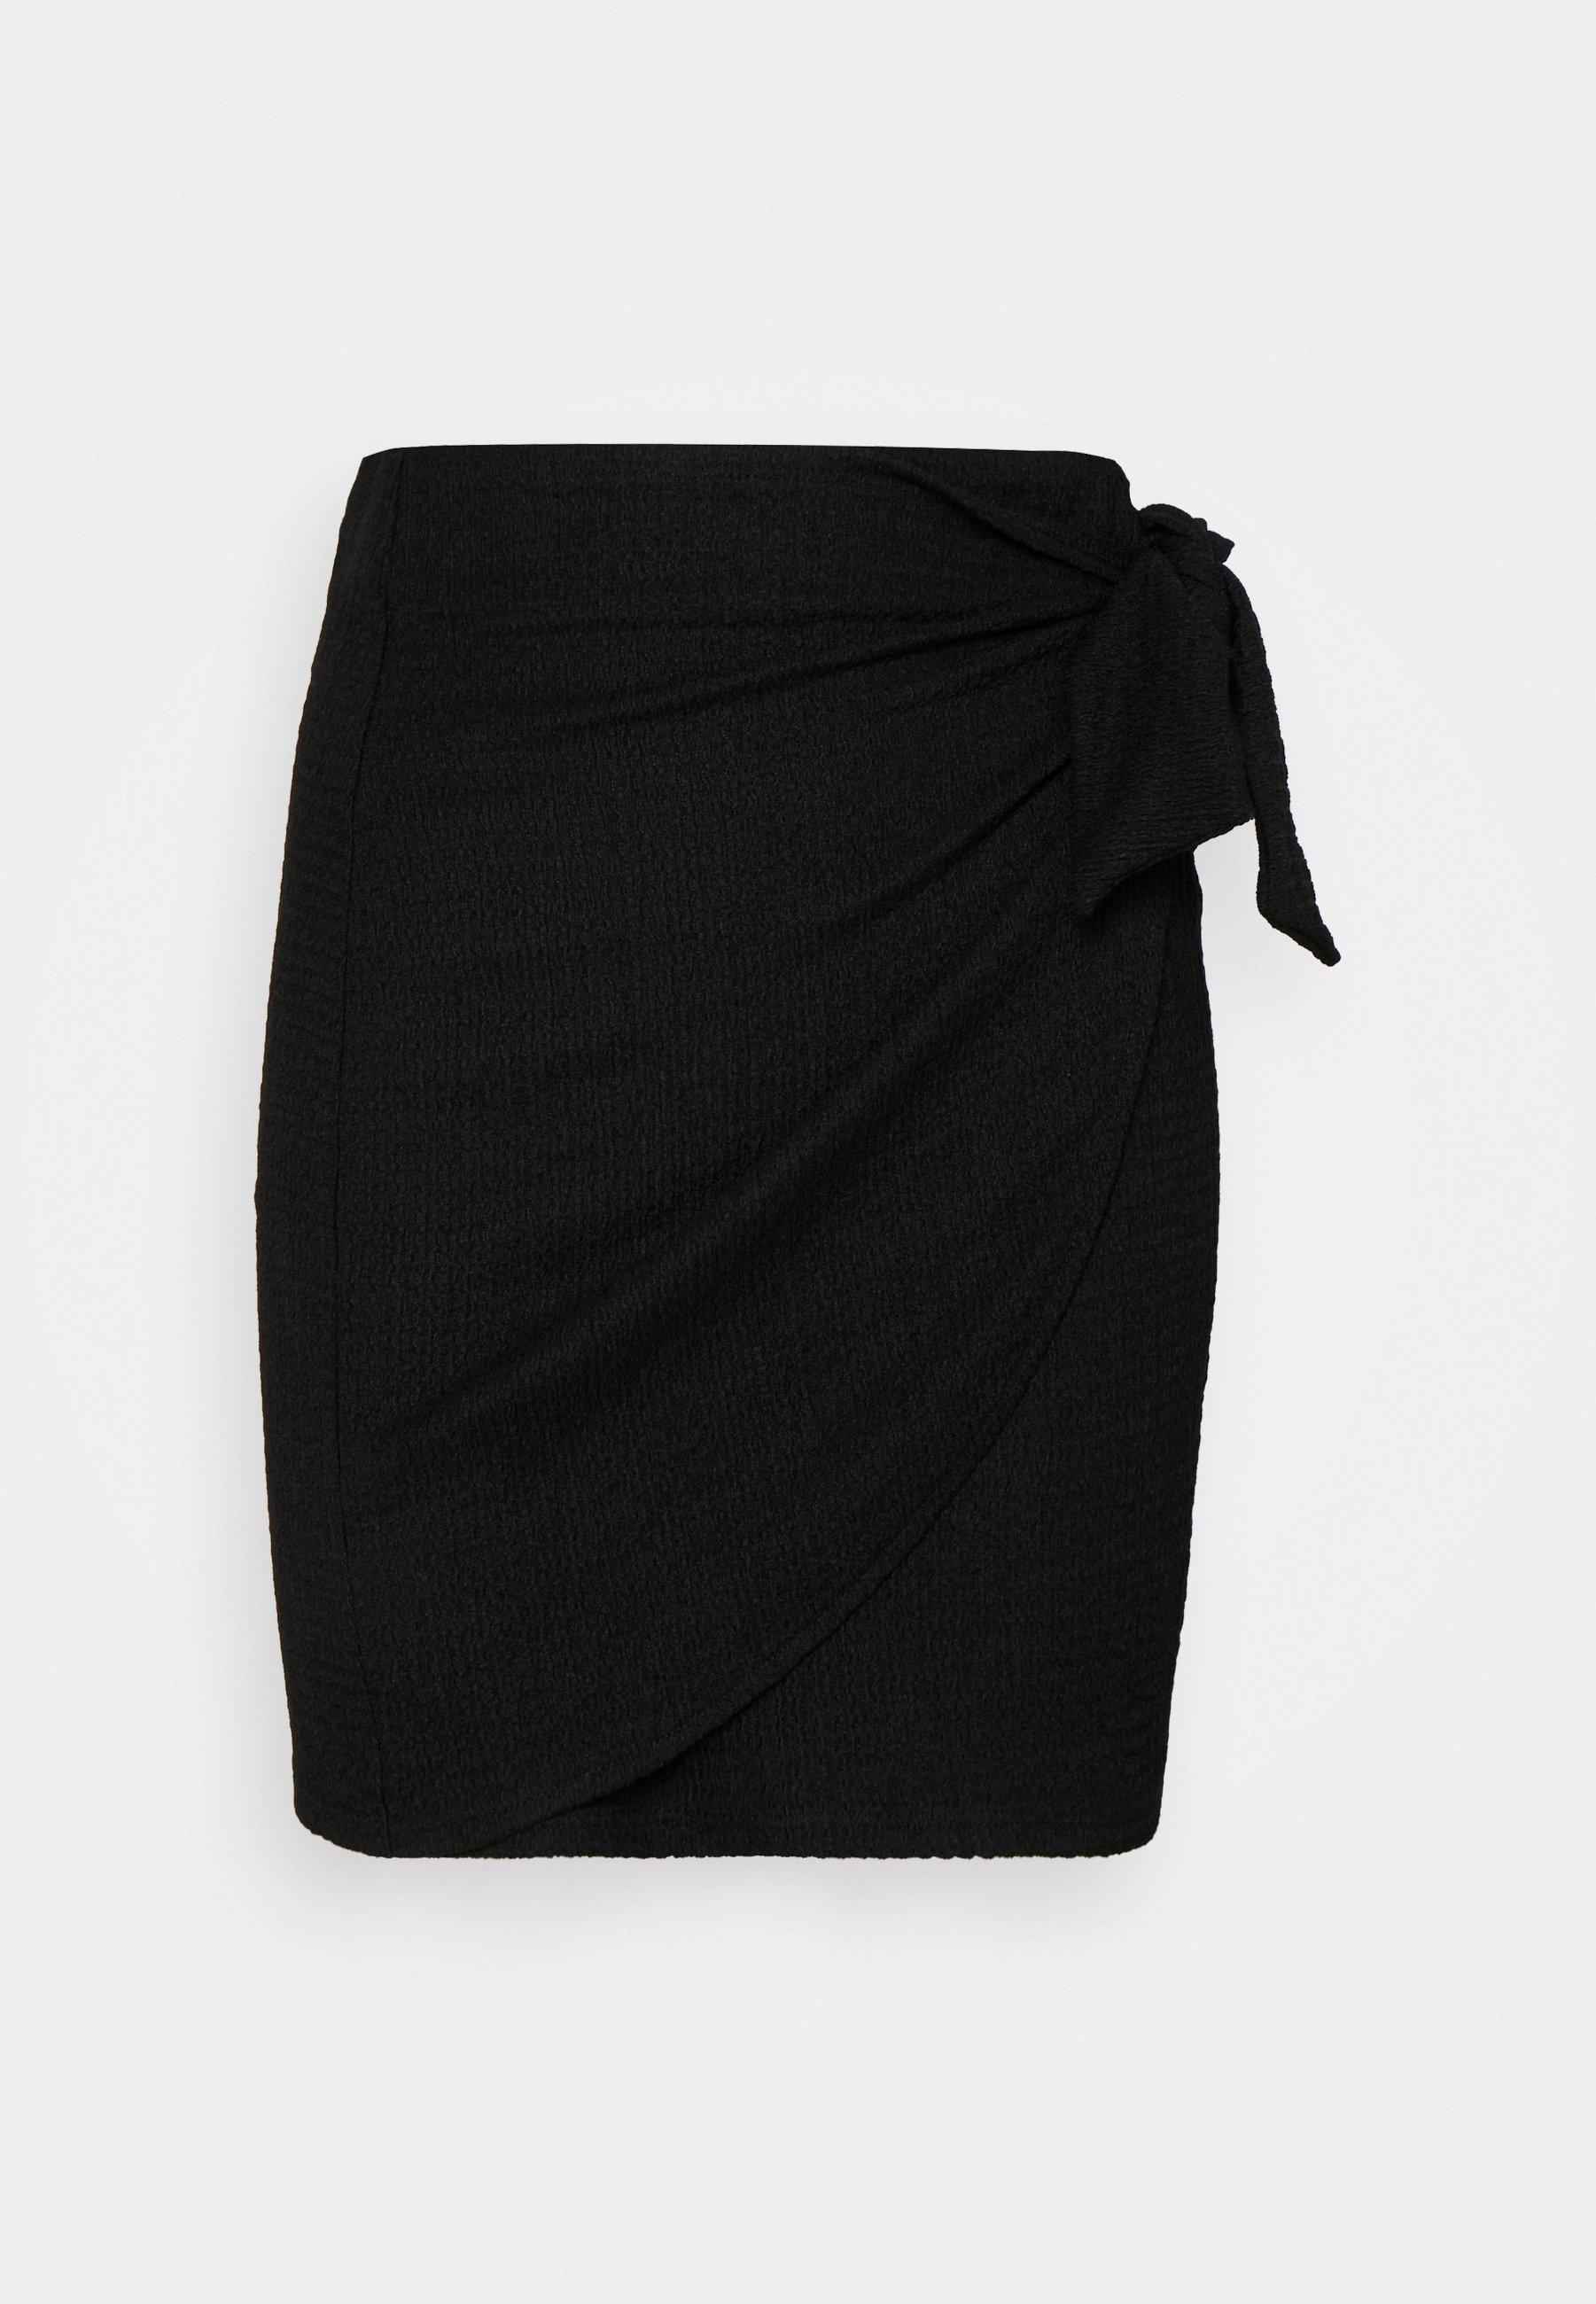 Femme ALIA SKIRT - Minijupe